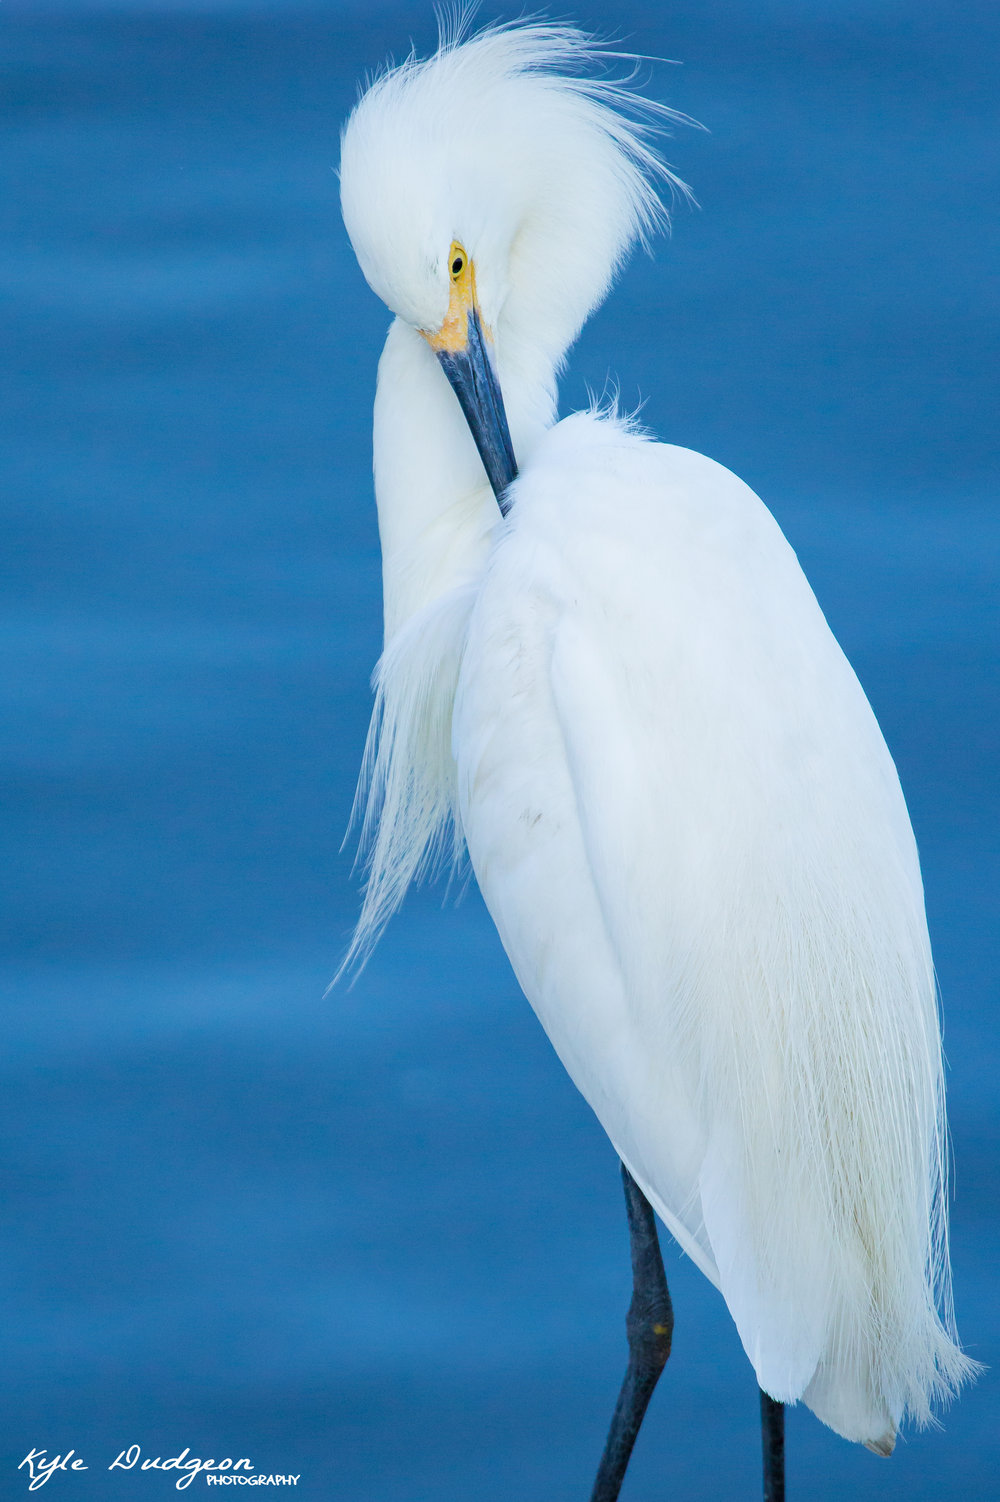 Snowy egret preening.